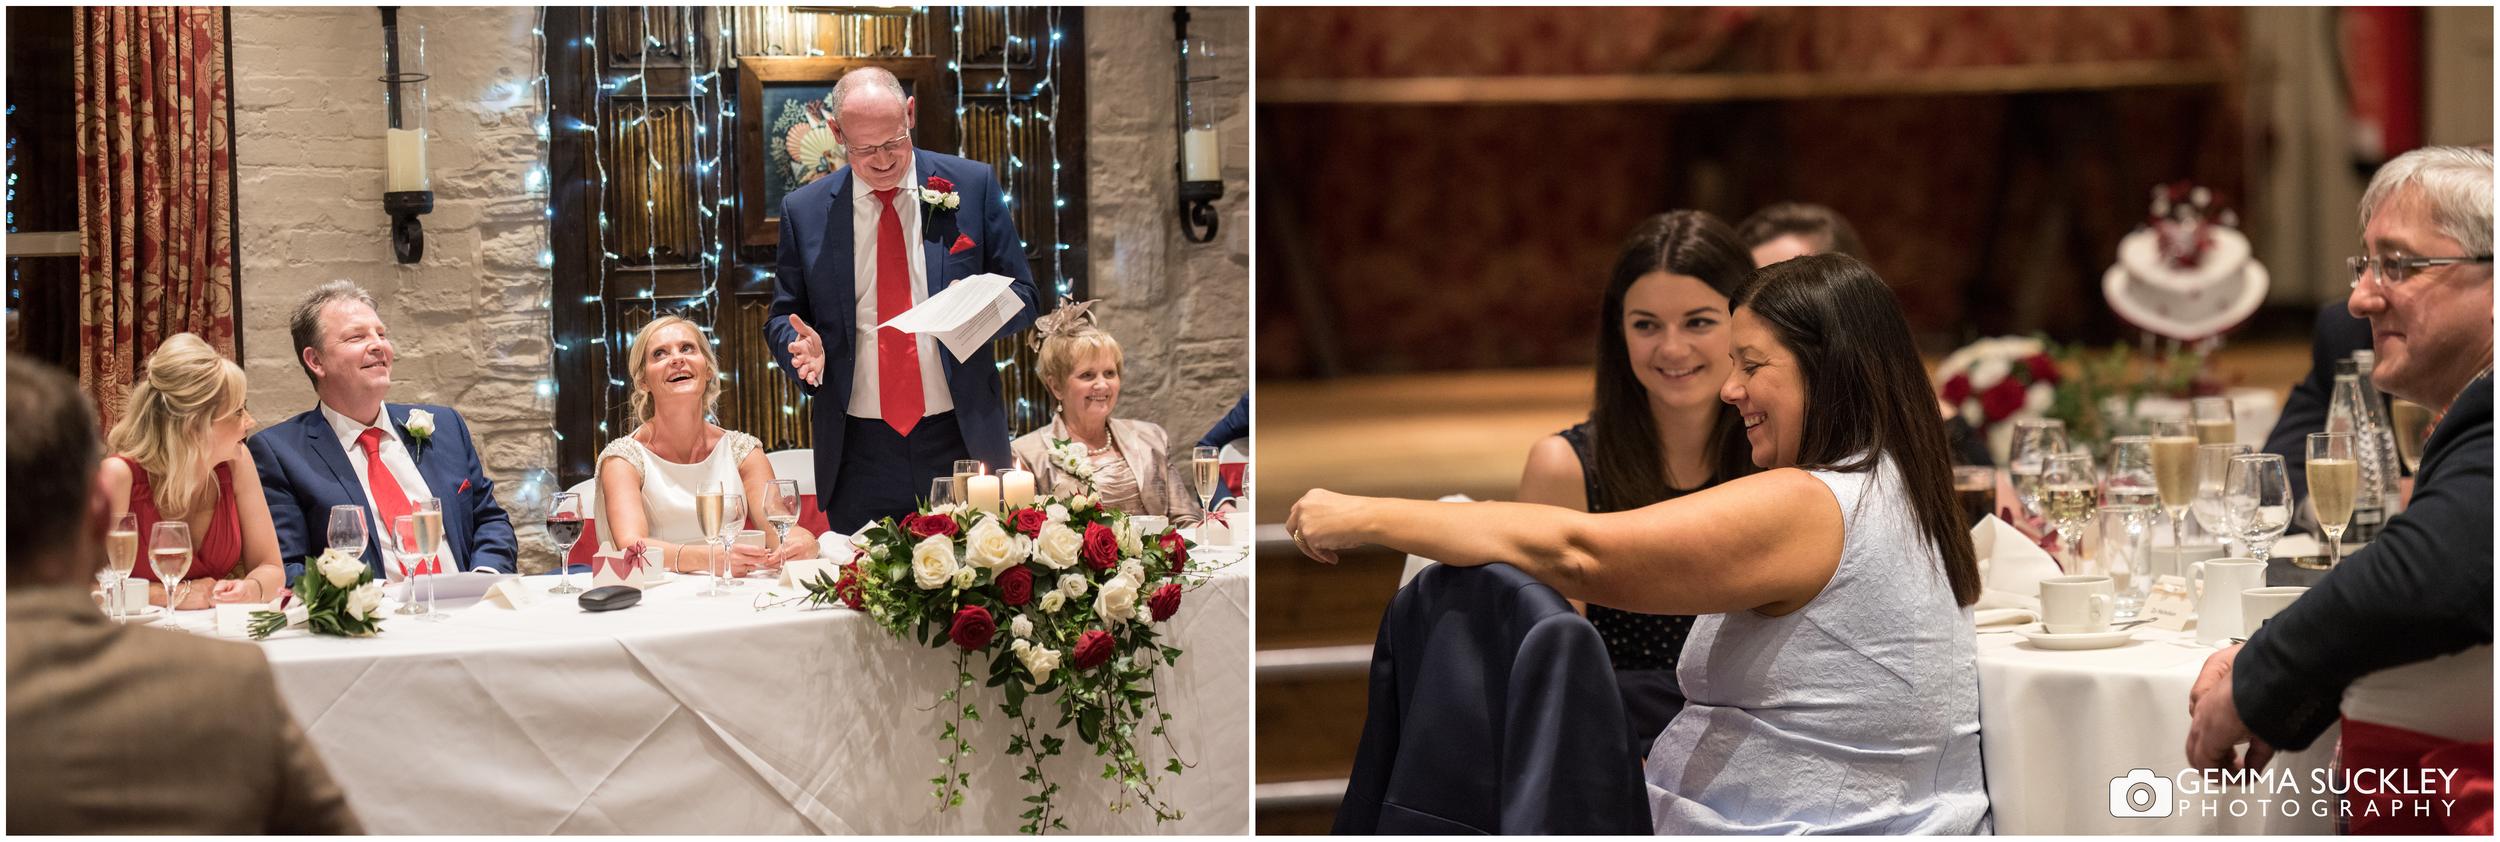 holdsworth-house-wedding-speeches.jpg